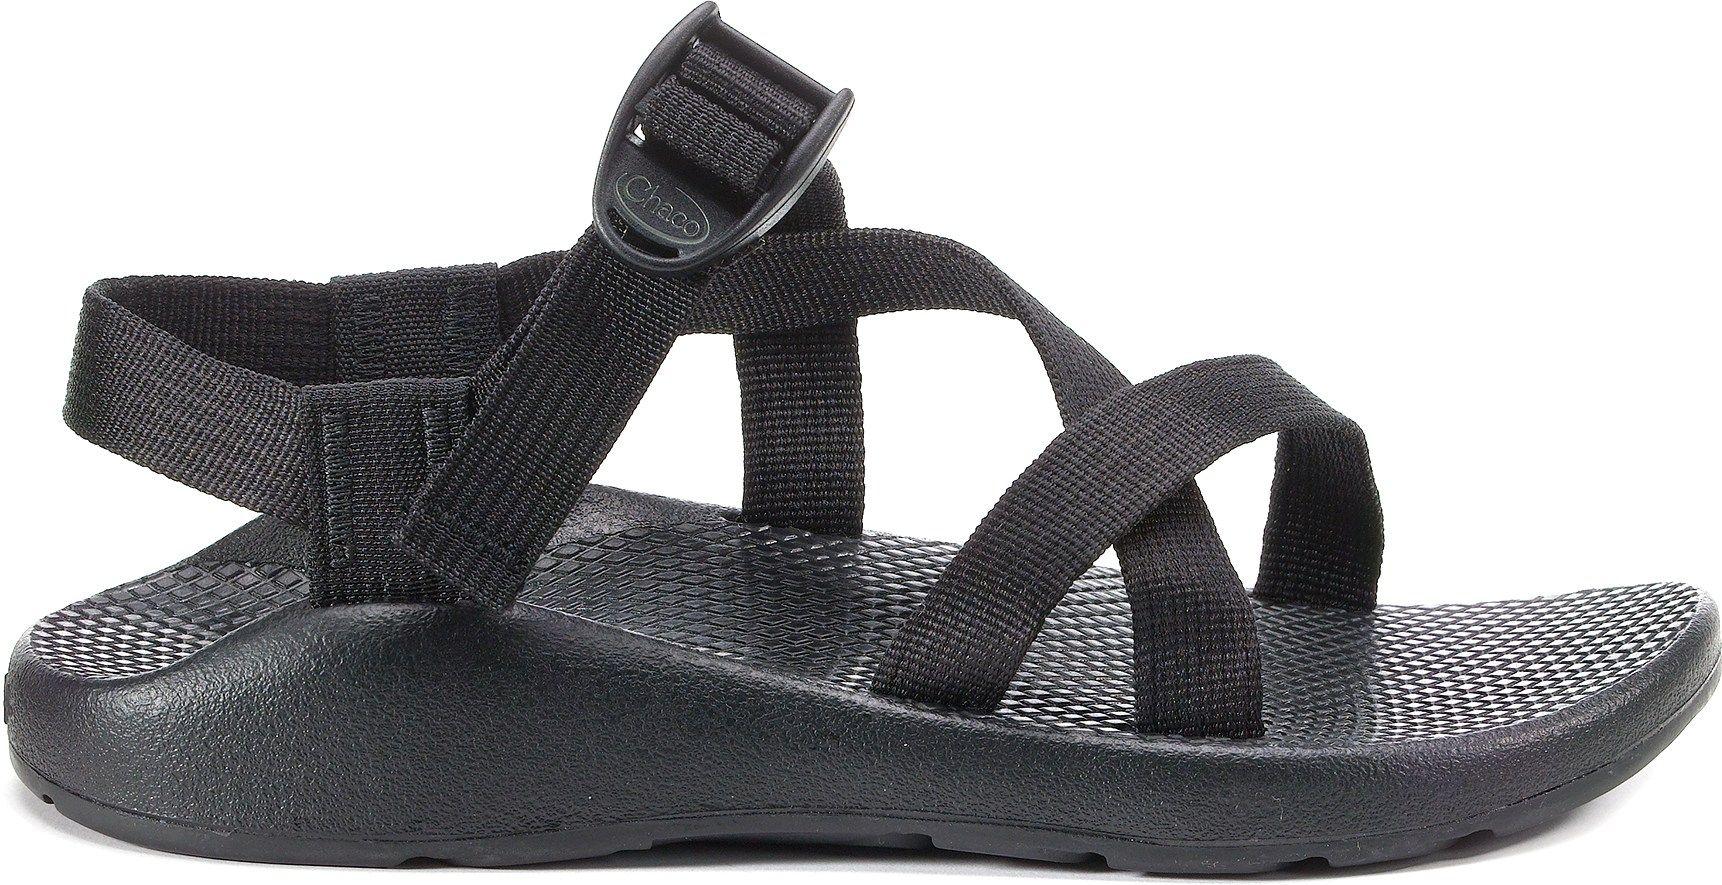 893f950b2b97 Black Chaco Yampa Sandal- NO toe loop size 8 women s